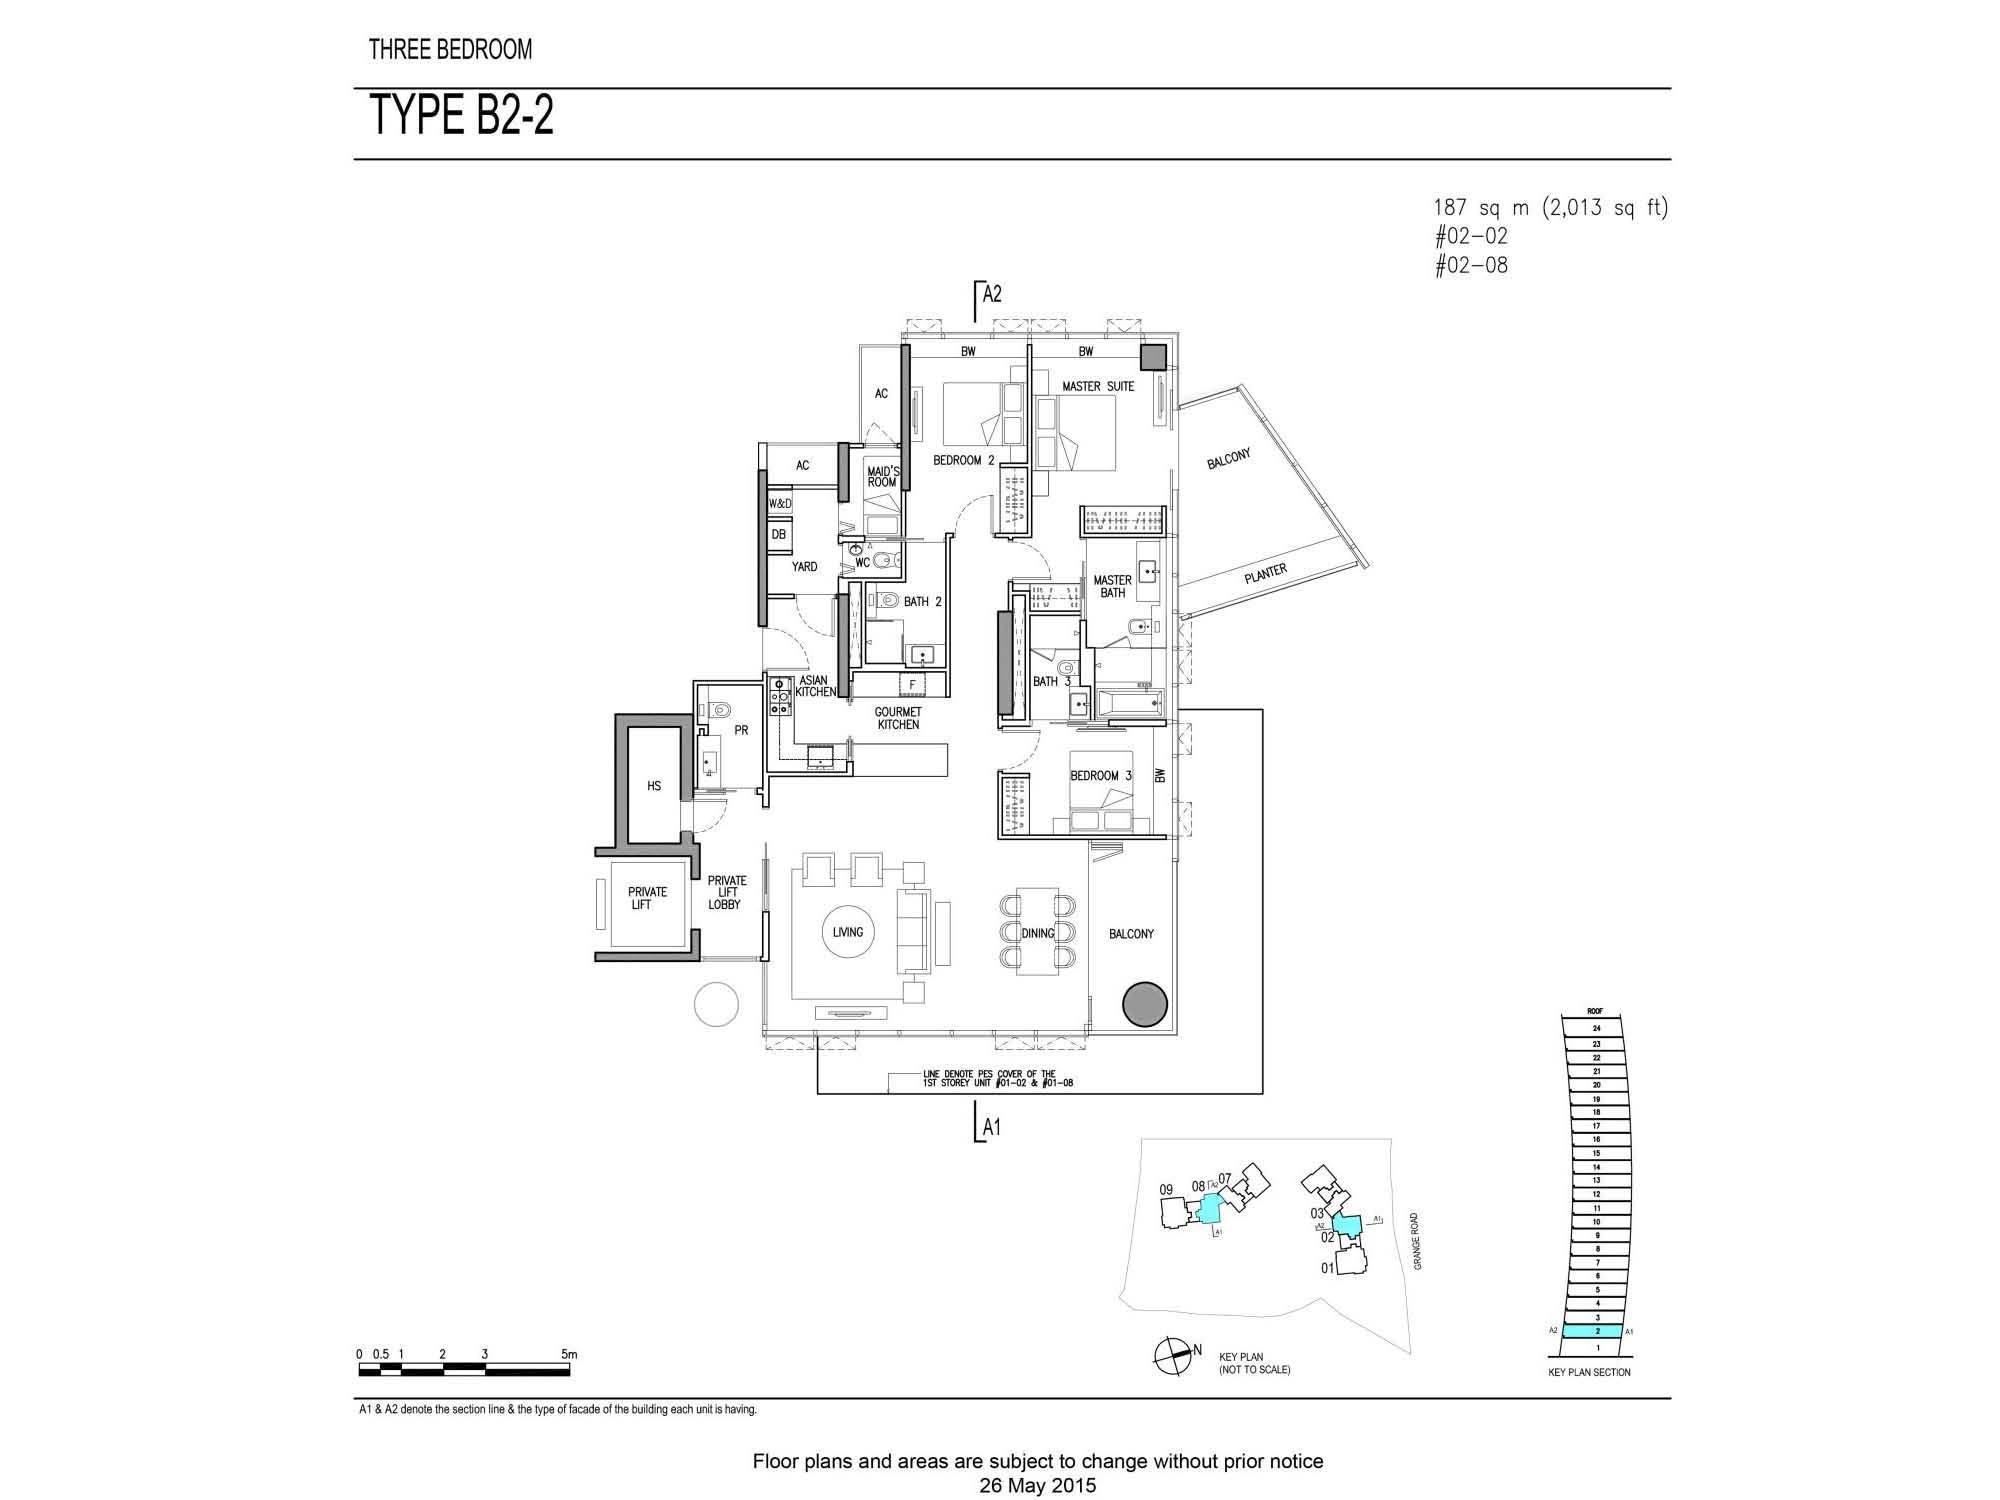 3Bdrm Type B2-2